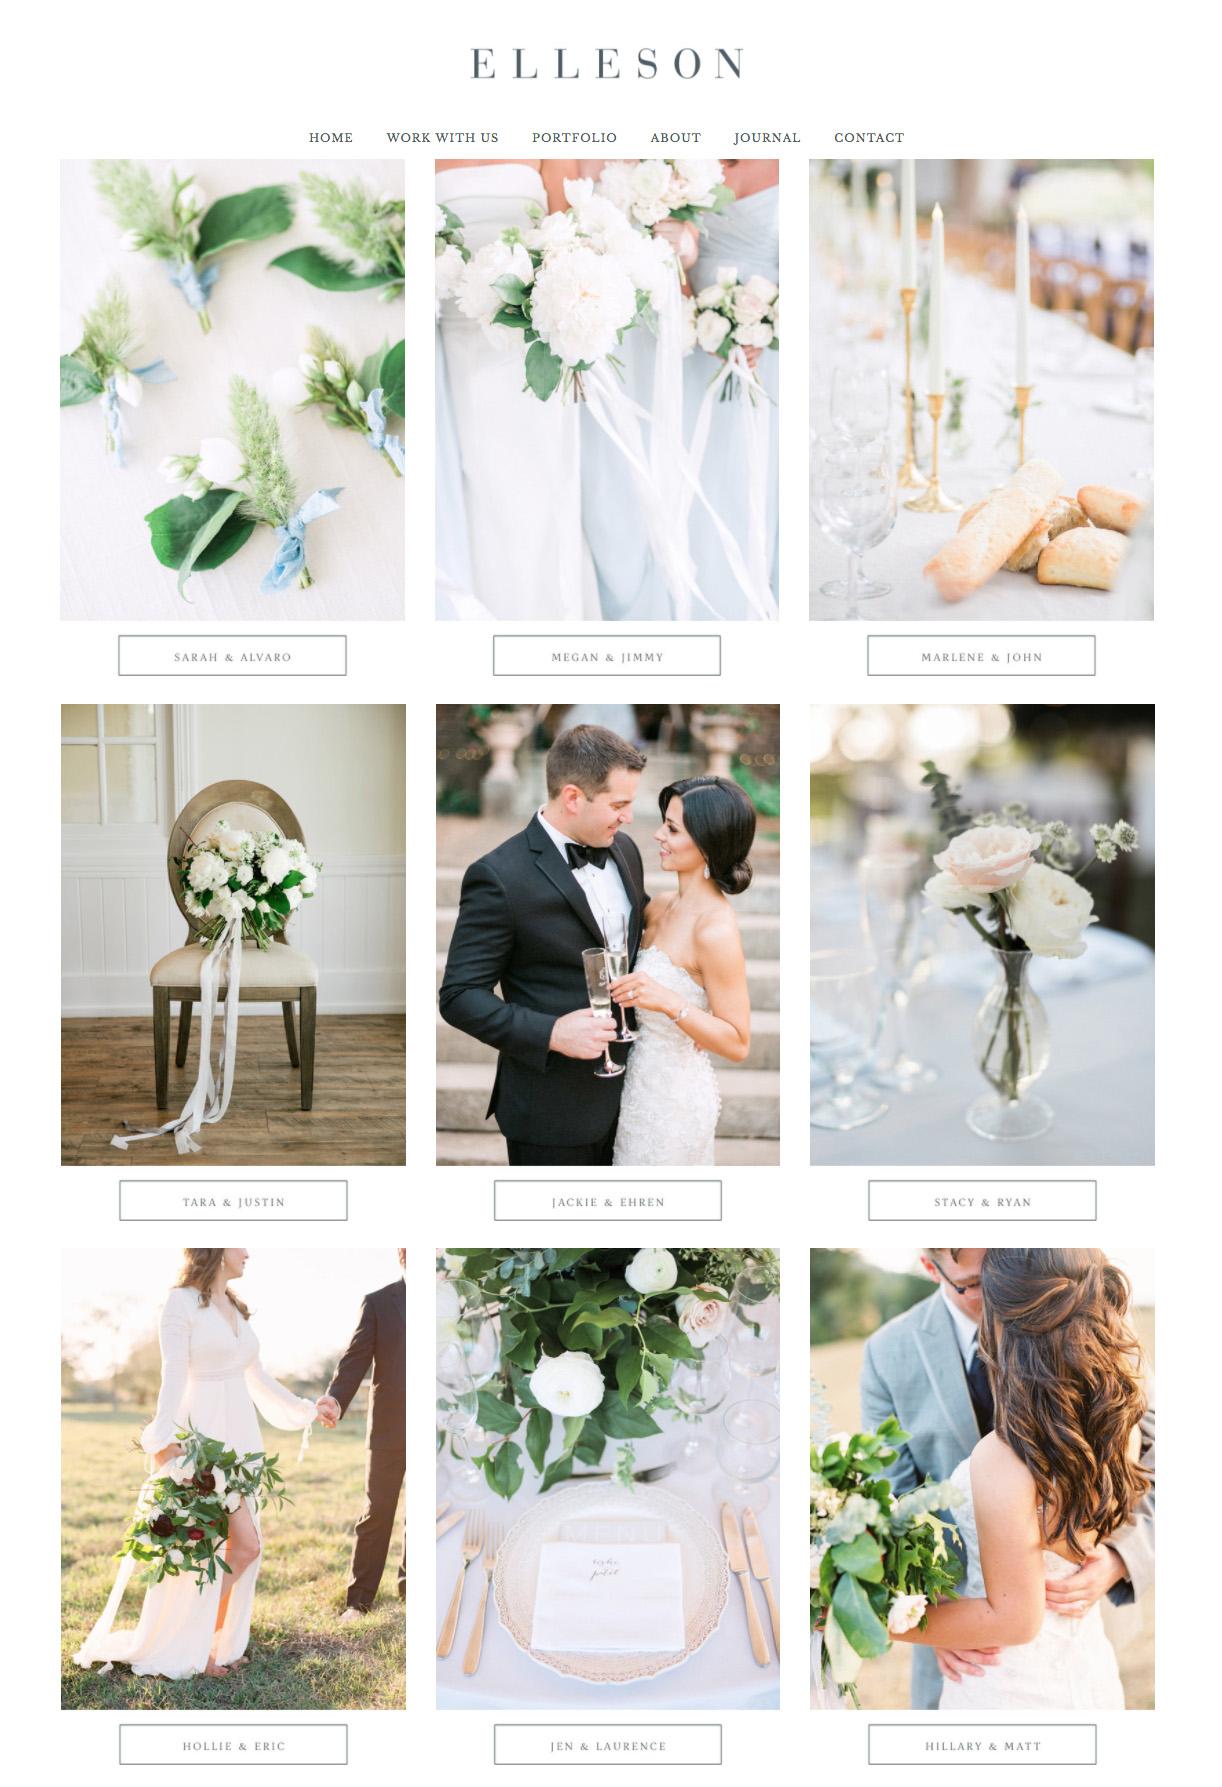 Squarespace Website Designer For Wedding Professionals and Creatives